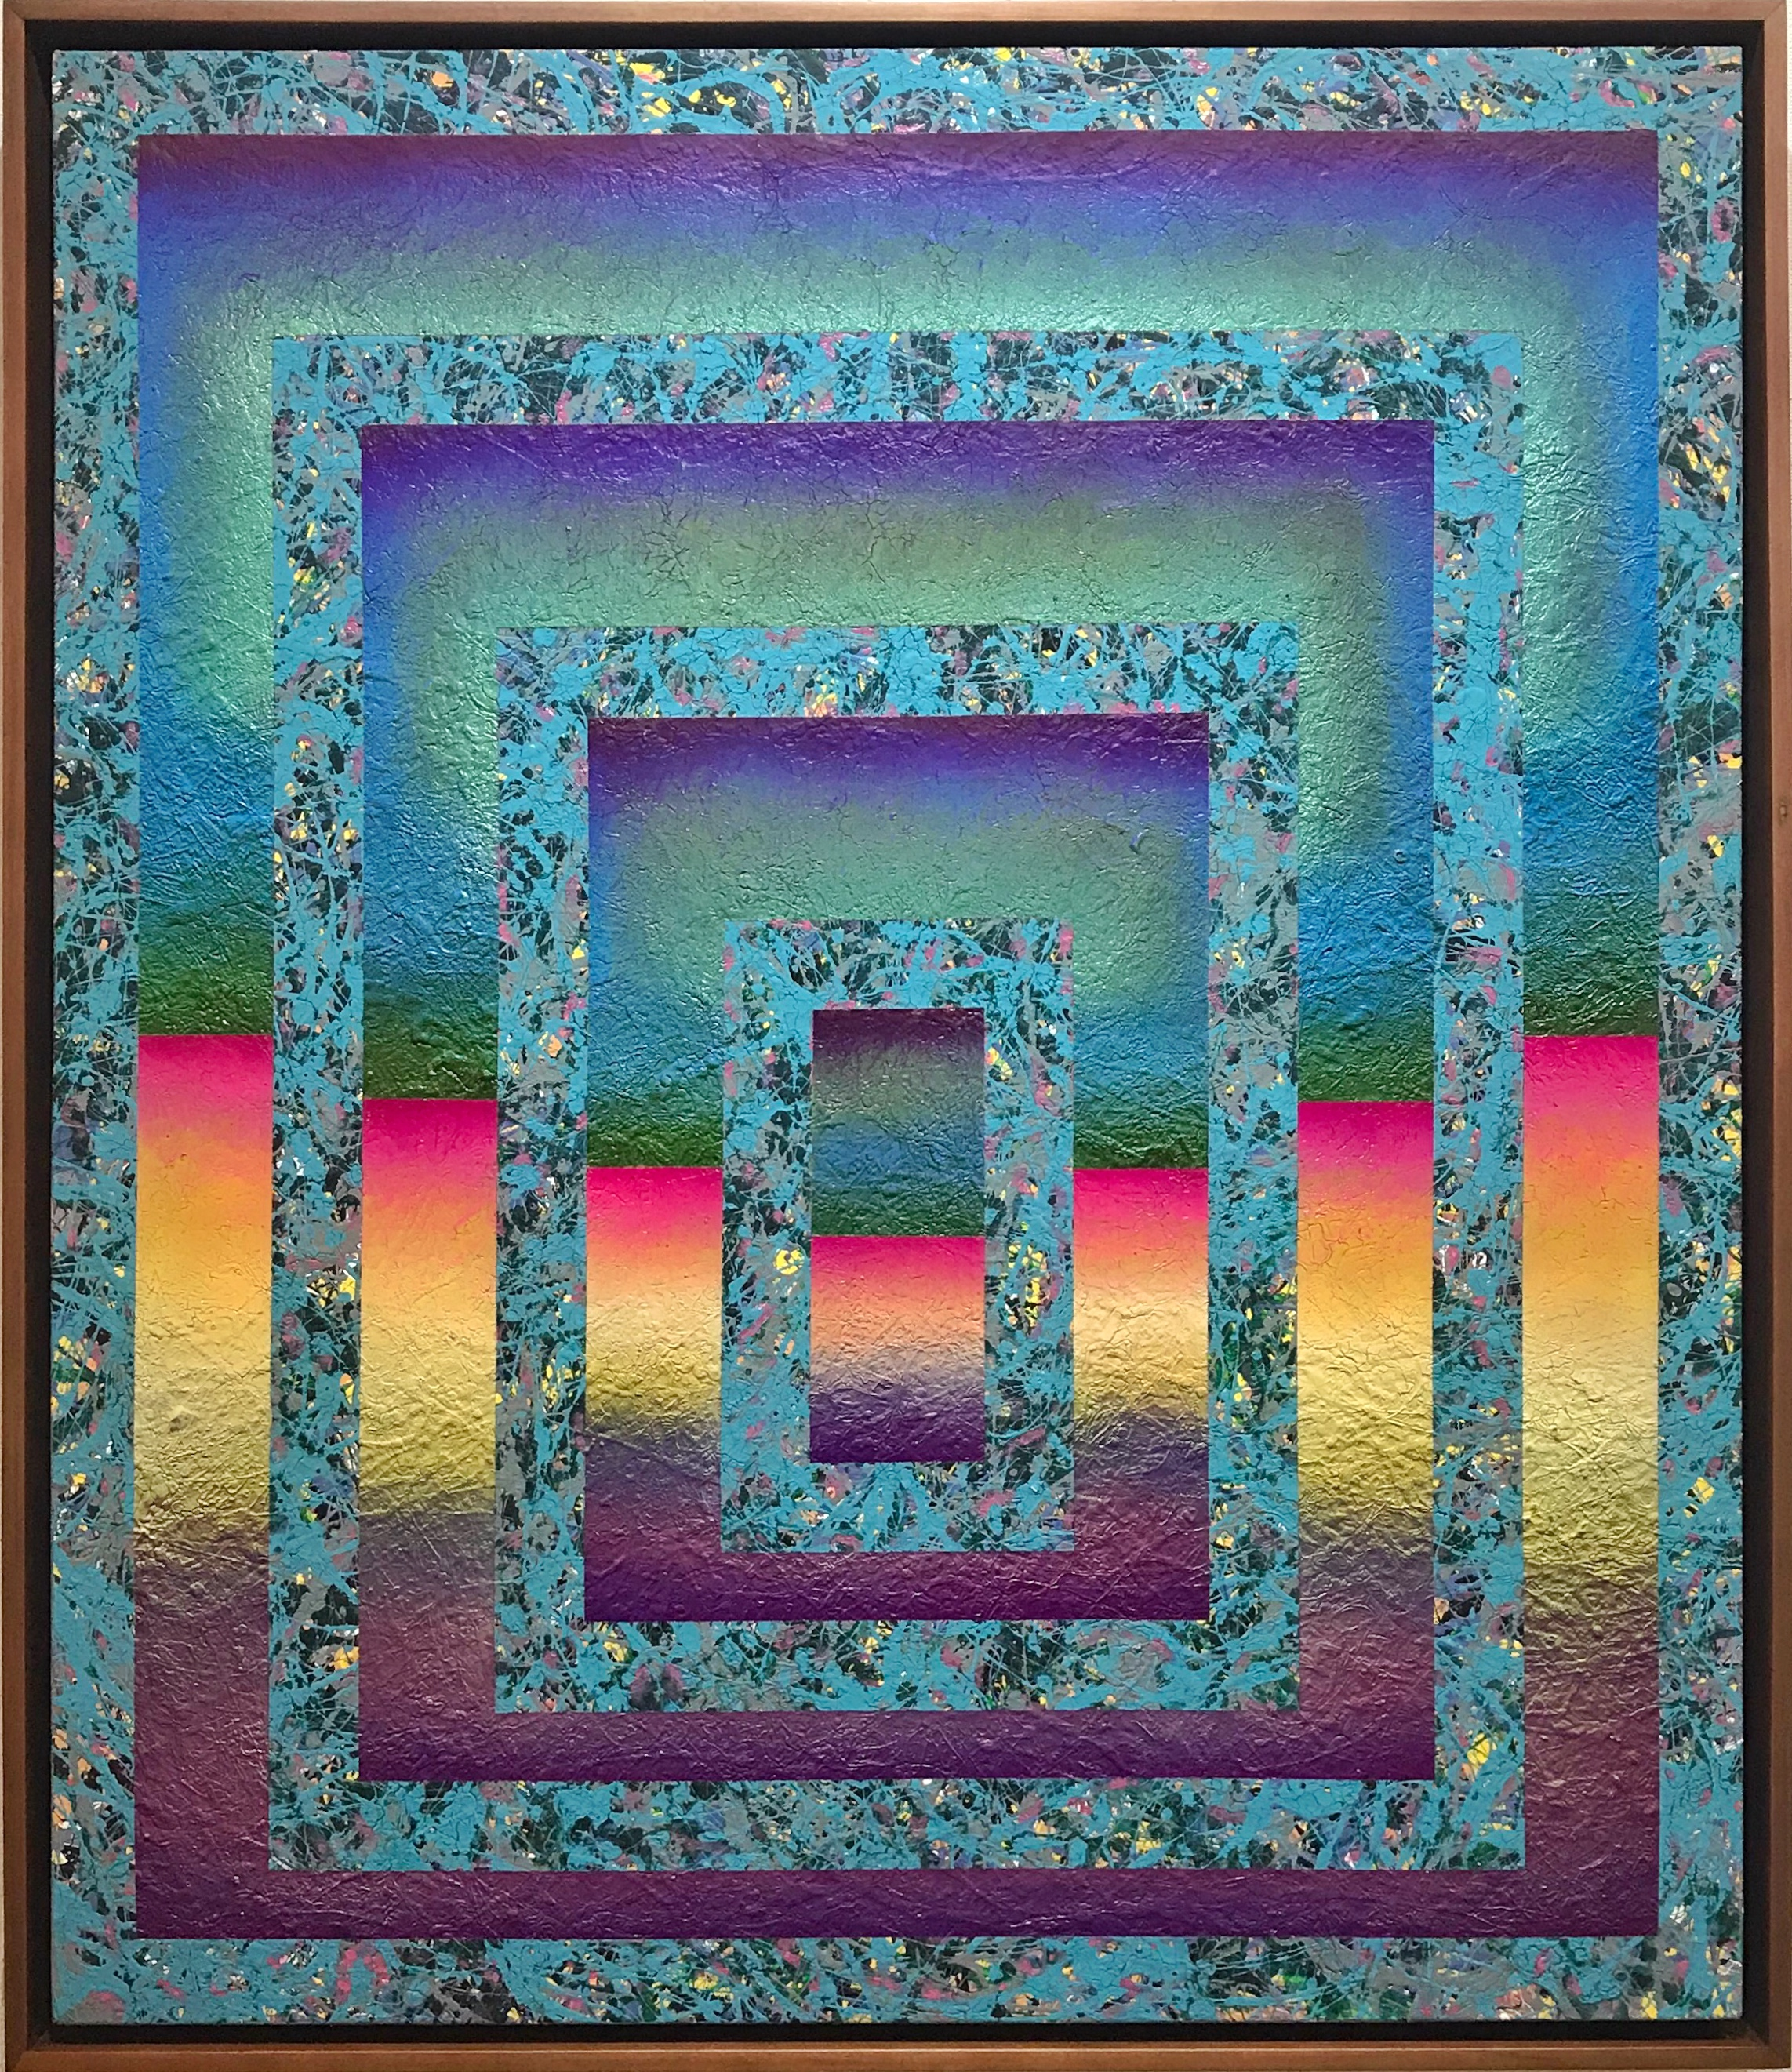 """Cosmic Mirage"" by Jose Gabriel Naguiat"